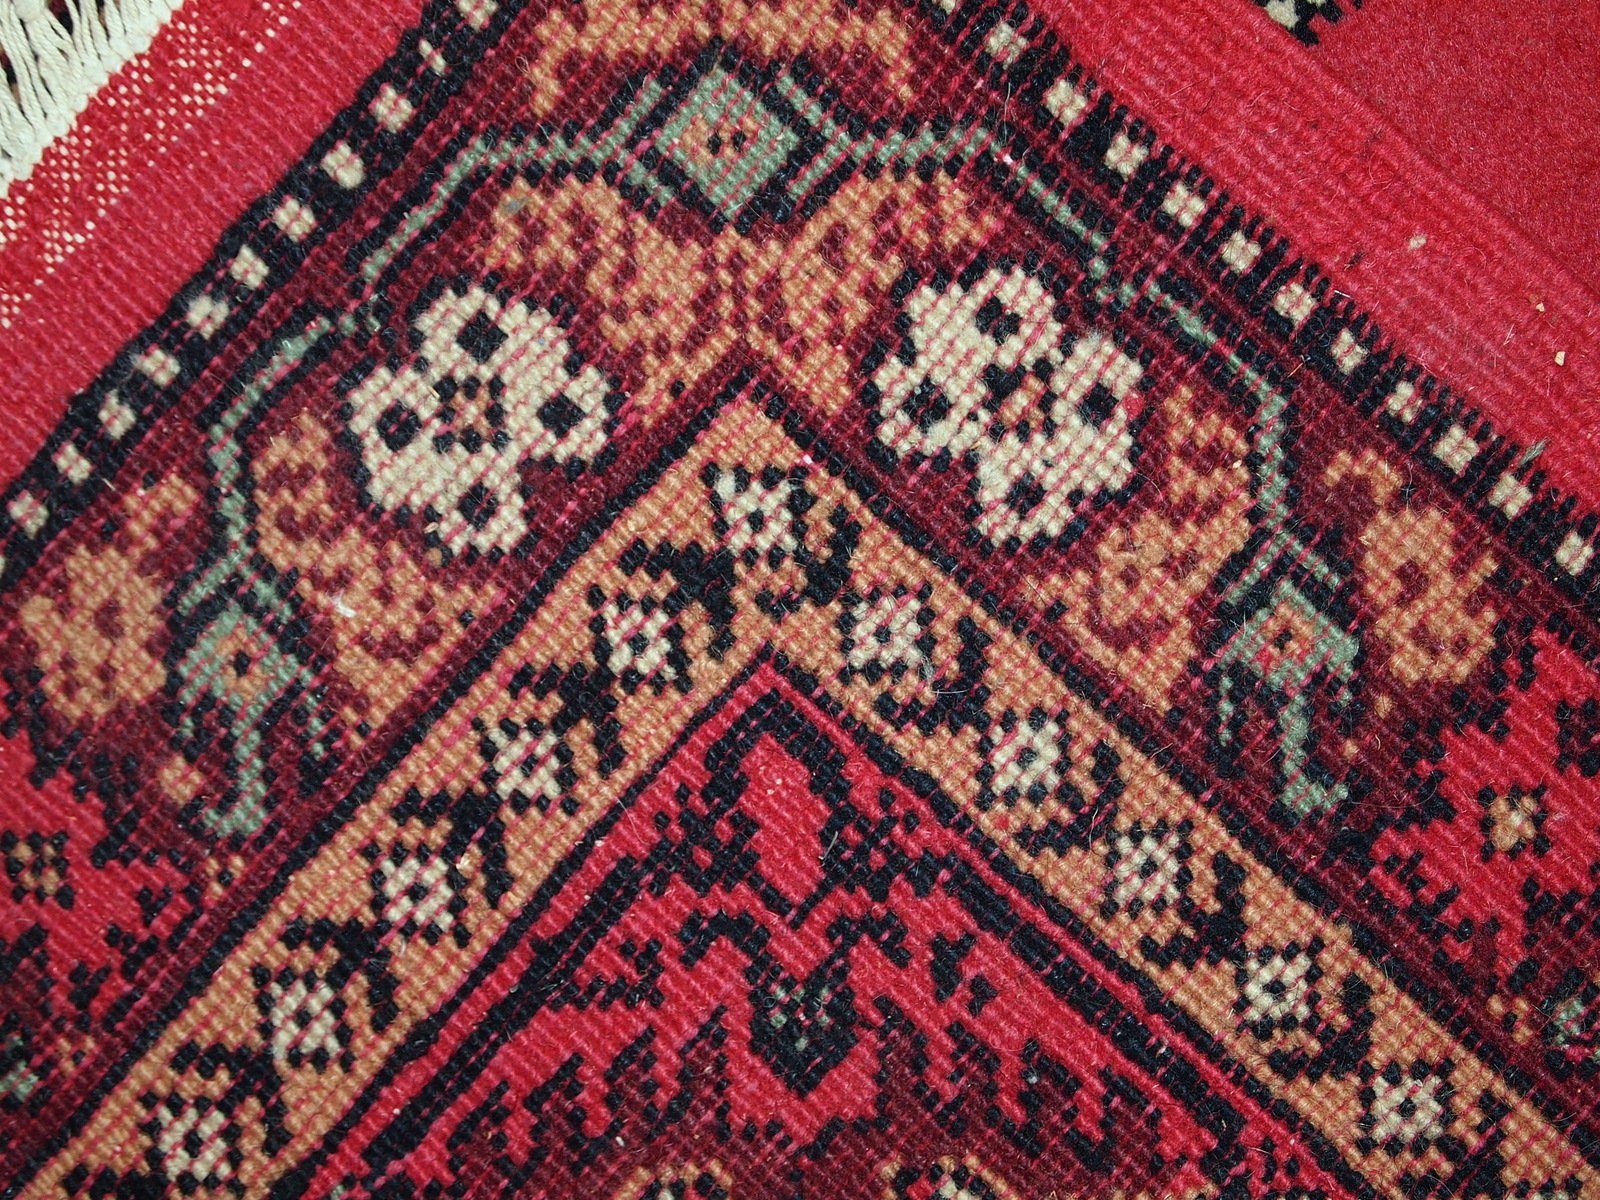 Vintage Handmade Algerian Berber Rug 1970s For Sale At Pamono